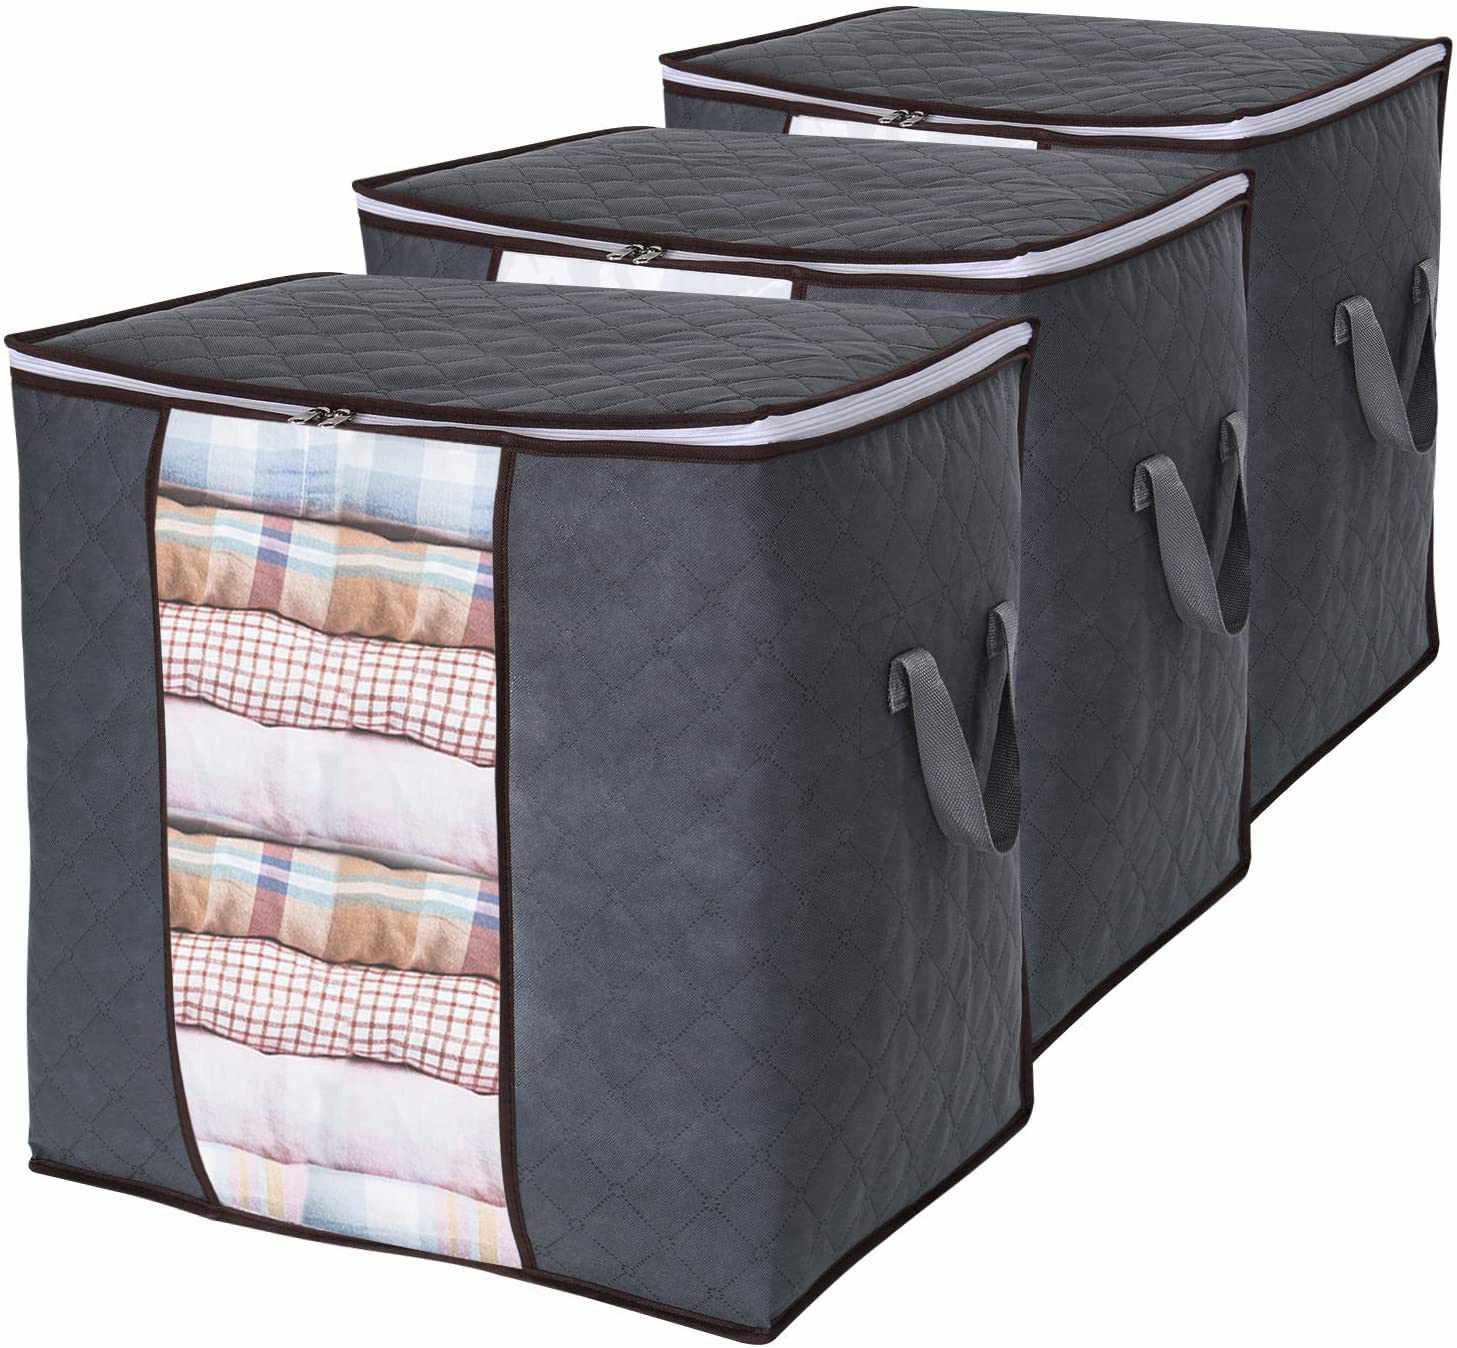 Lifewit Clothes Storage Bag